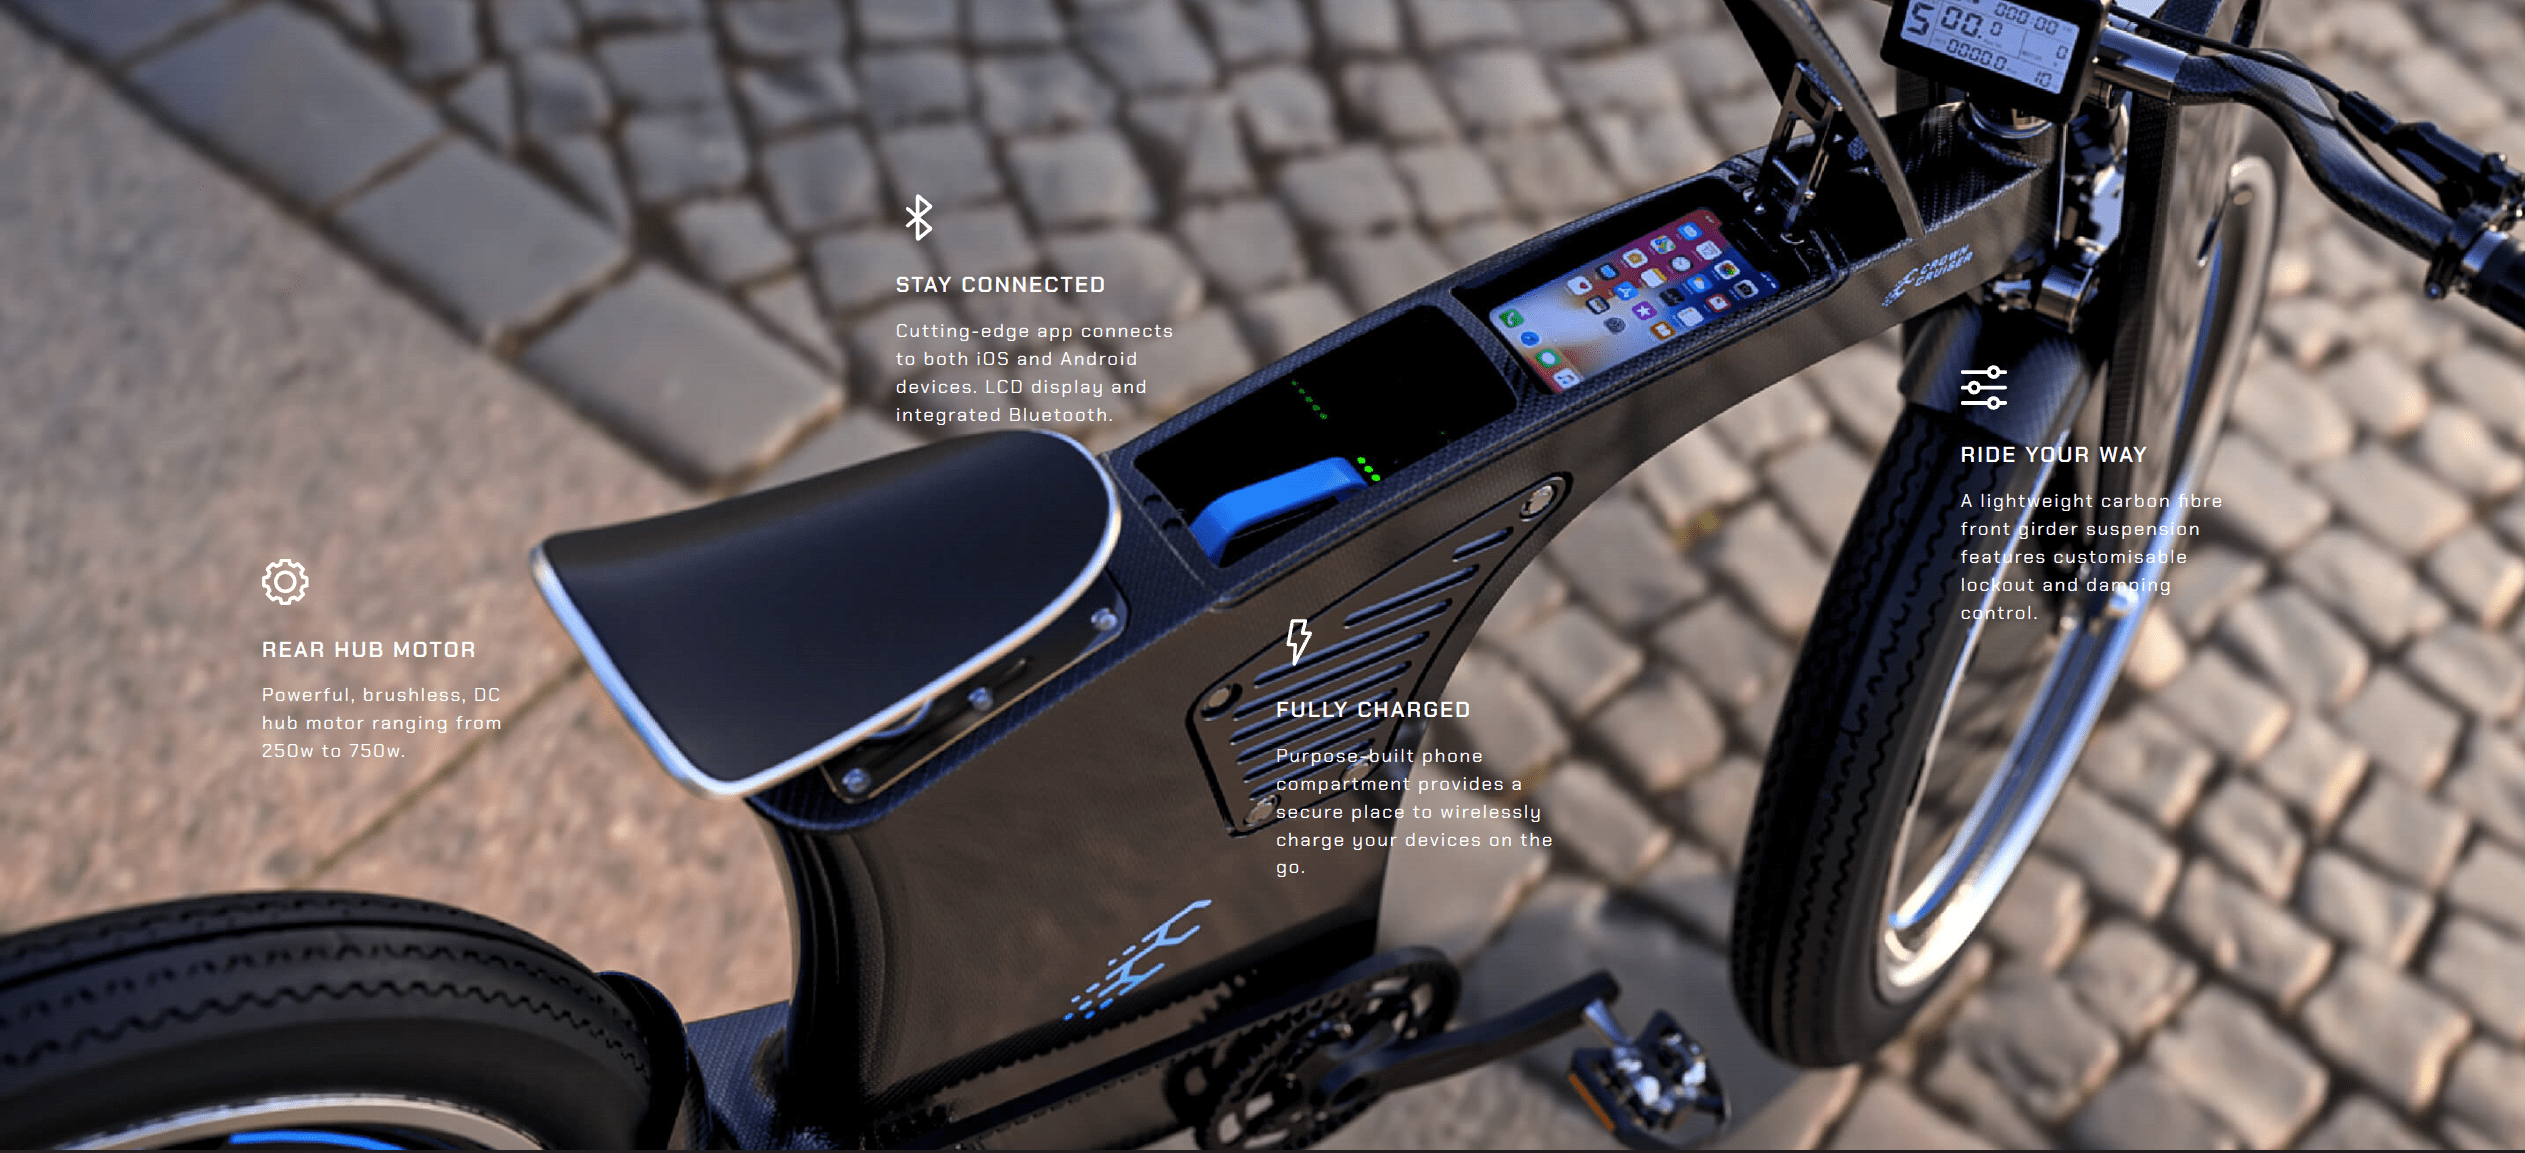 pes-team-develop-state-of-the-art-carbon-fibre-ebike